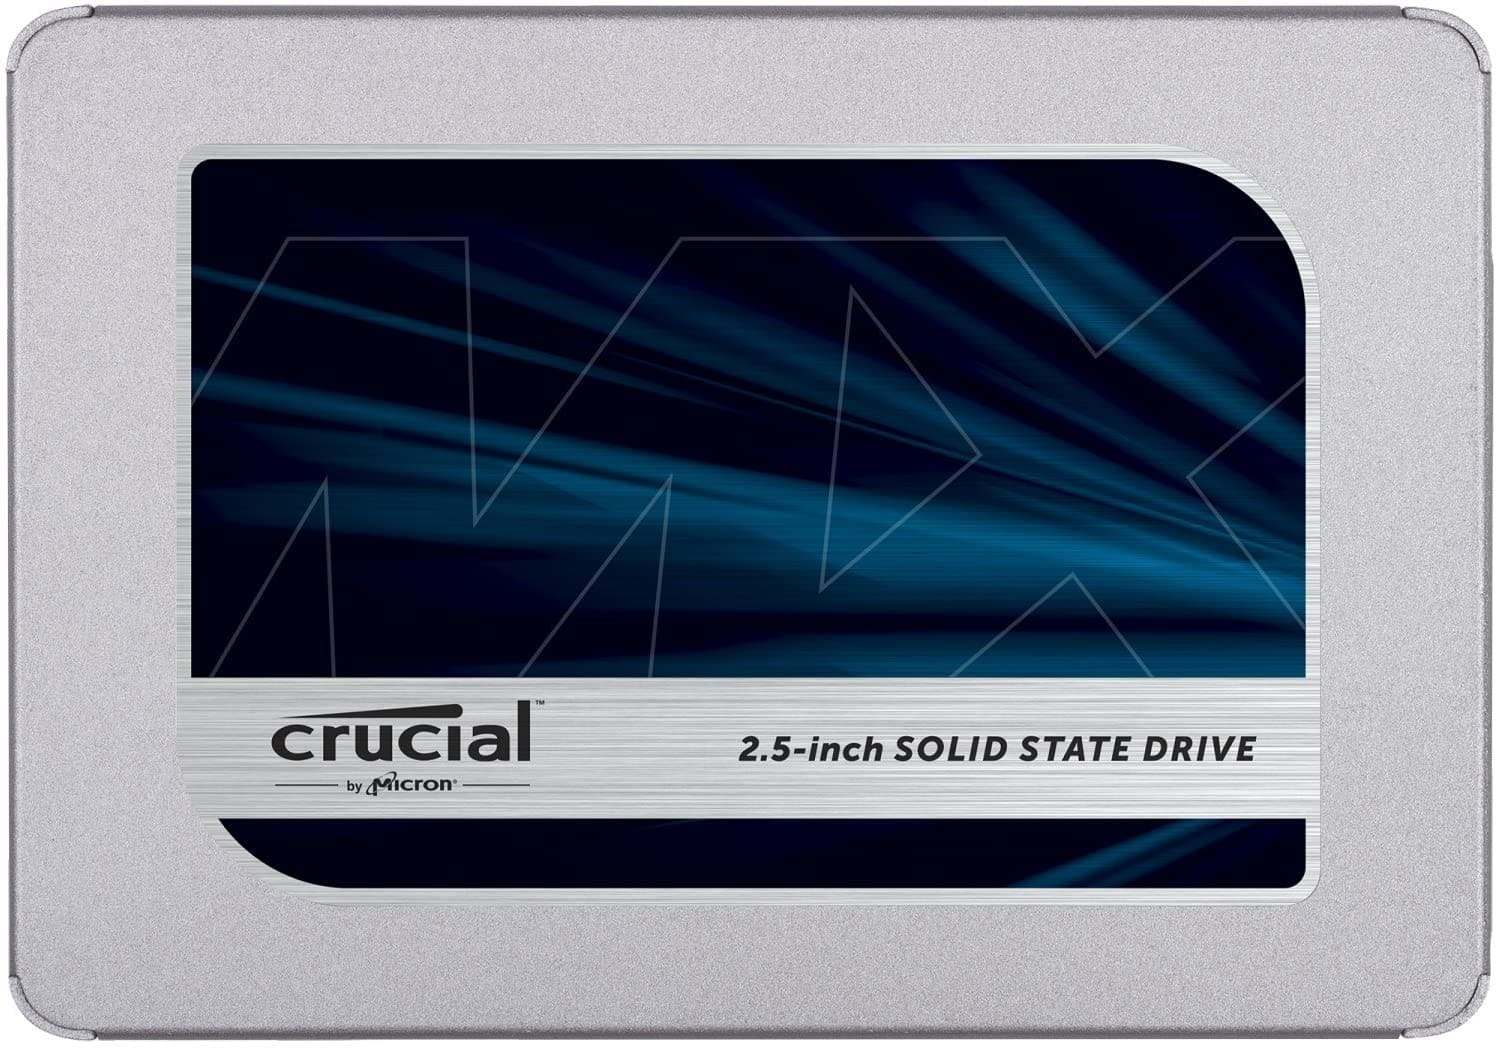 Amazon.com: Crucial MX500 1TB 3D NAND SATA 2.5 Inch Internal SSD, up to 560MB/s - CT1000MX500SSD1 : Electronics $81.99